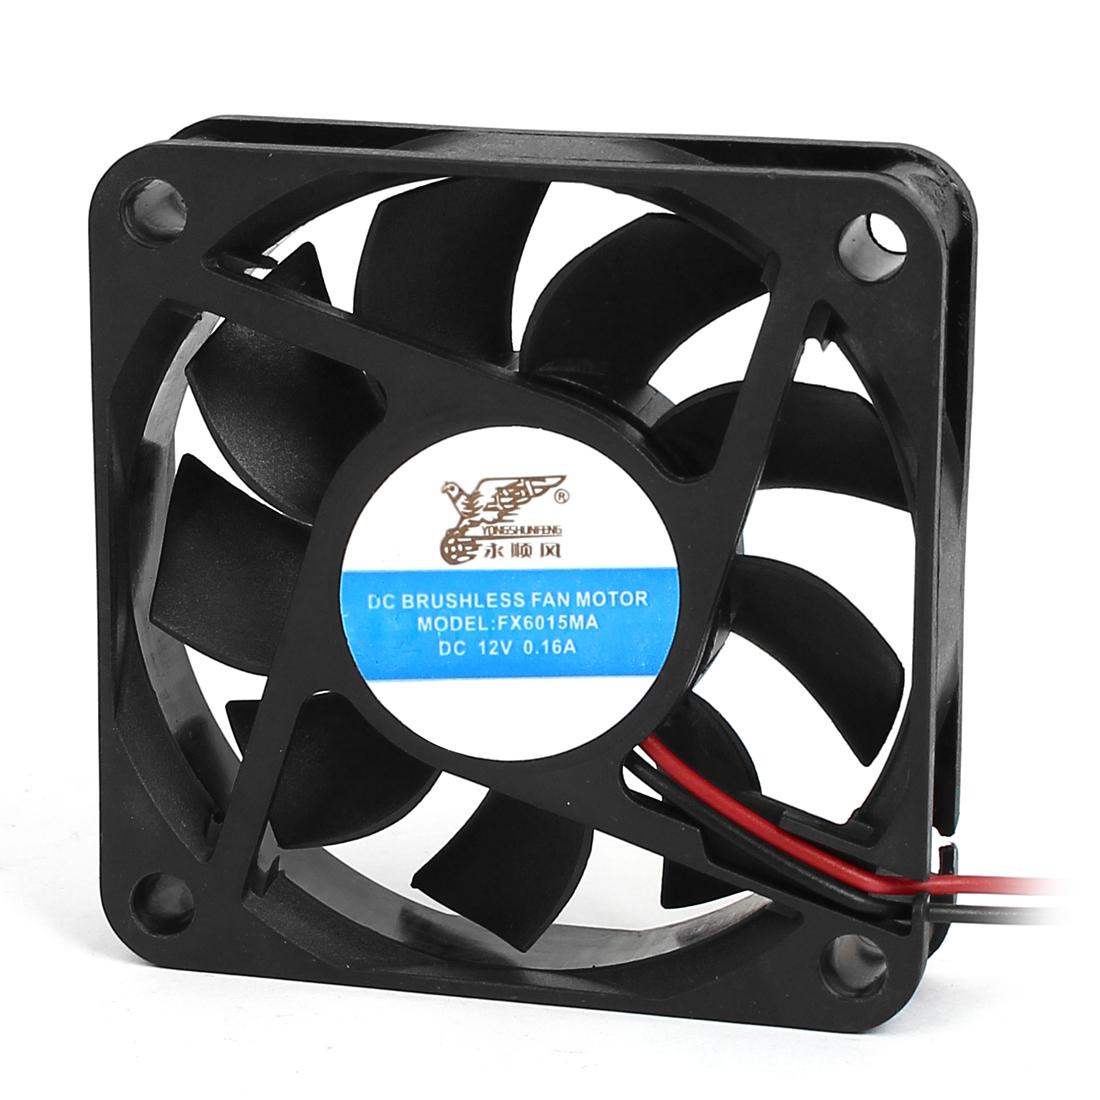 DC 12V 0.16A Computer Case Heatsink Cooler Brushless CPU Cooling Fan 6 x 6 x 1.5cm